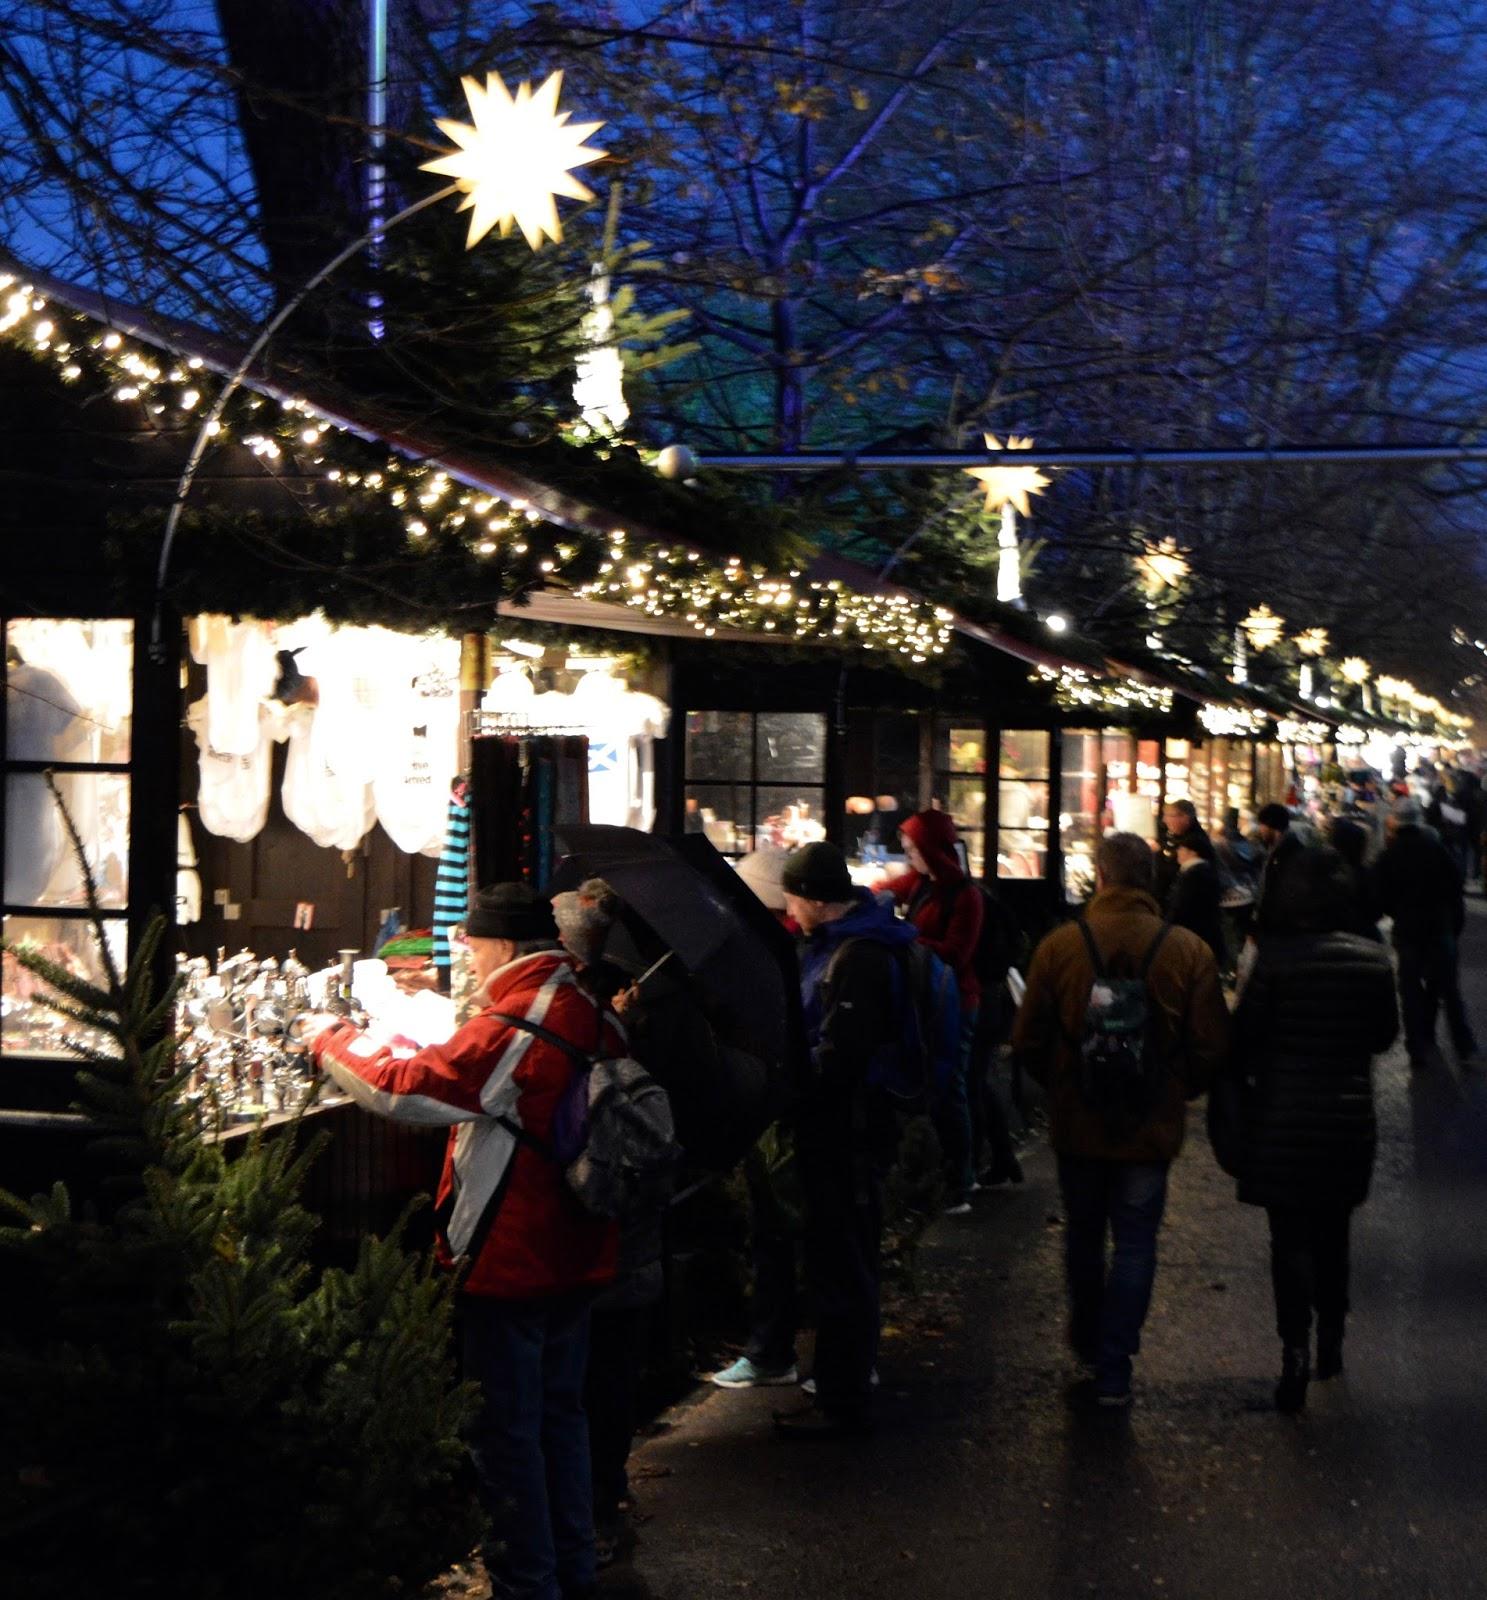 10 Reasons to Visit Edinburgh in December - Prince's Street Christmas Market